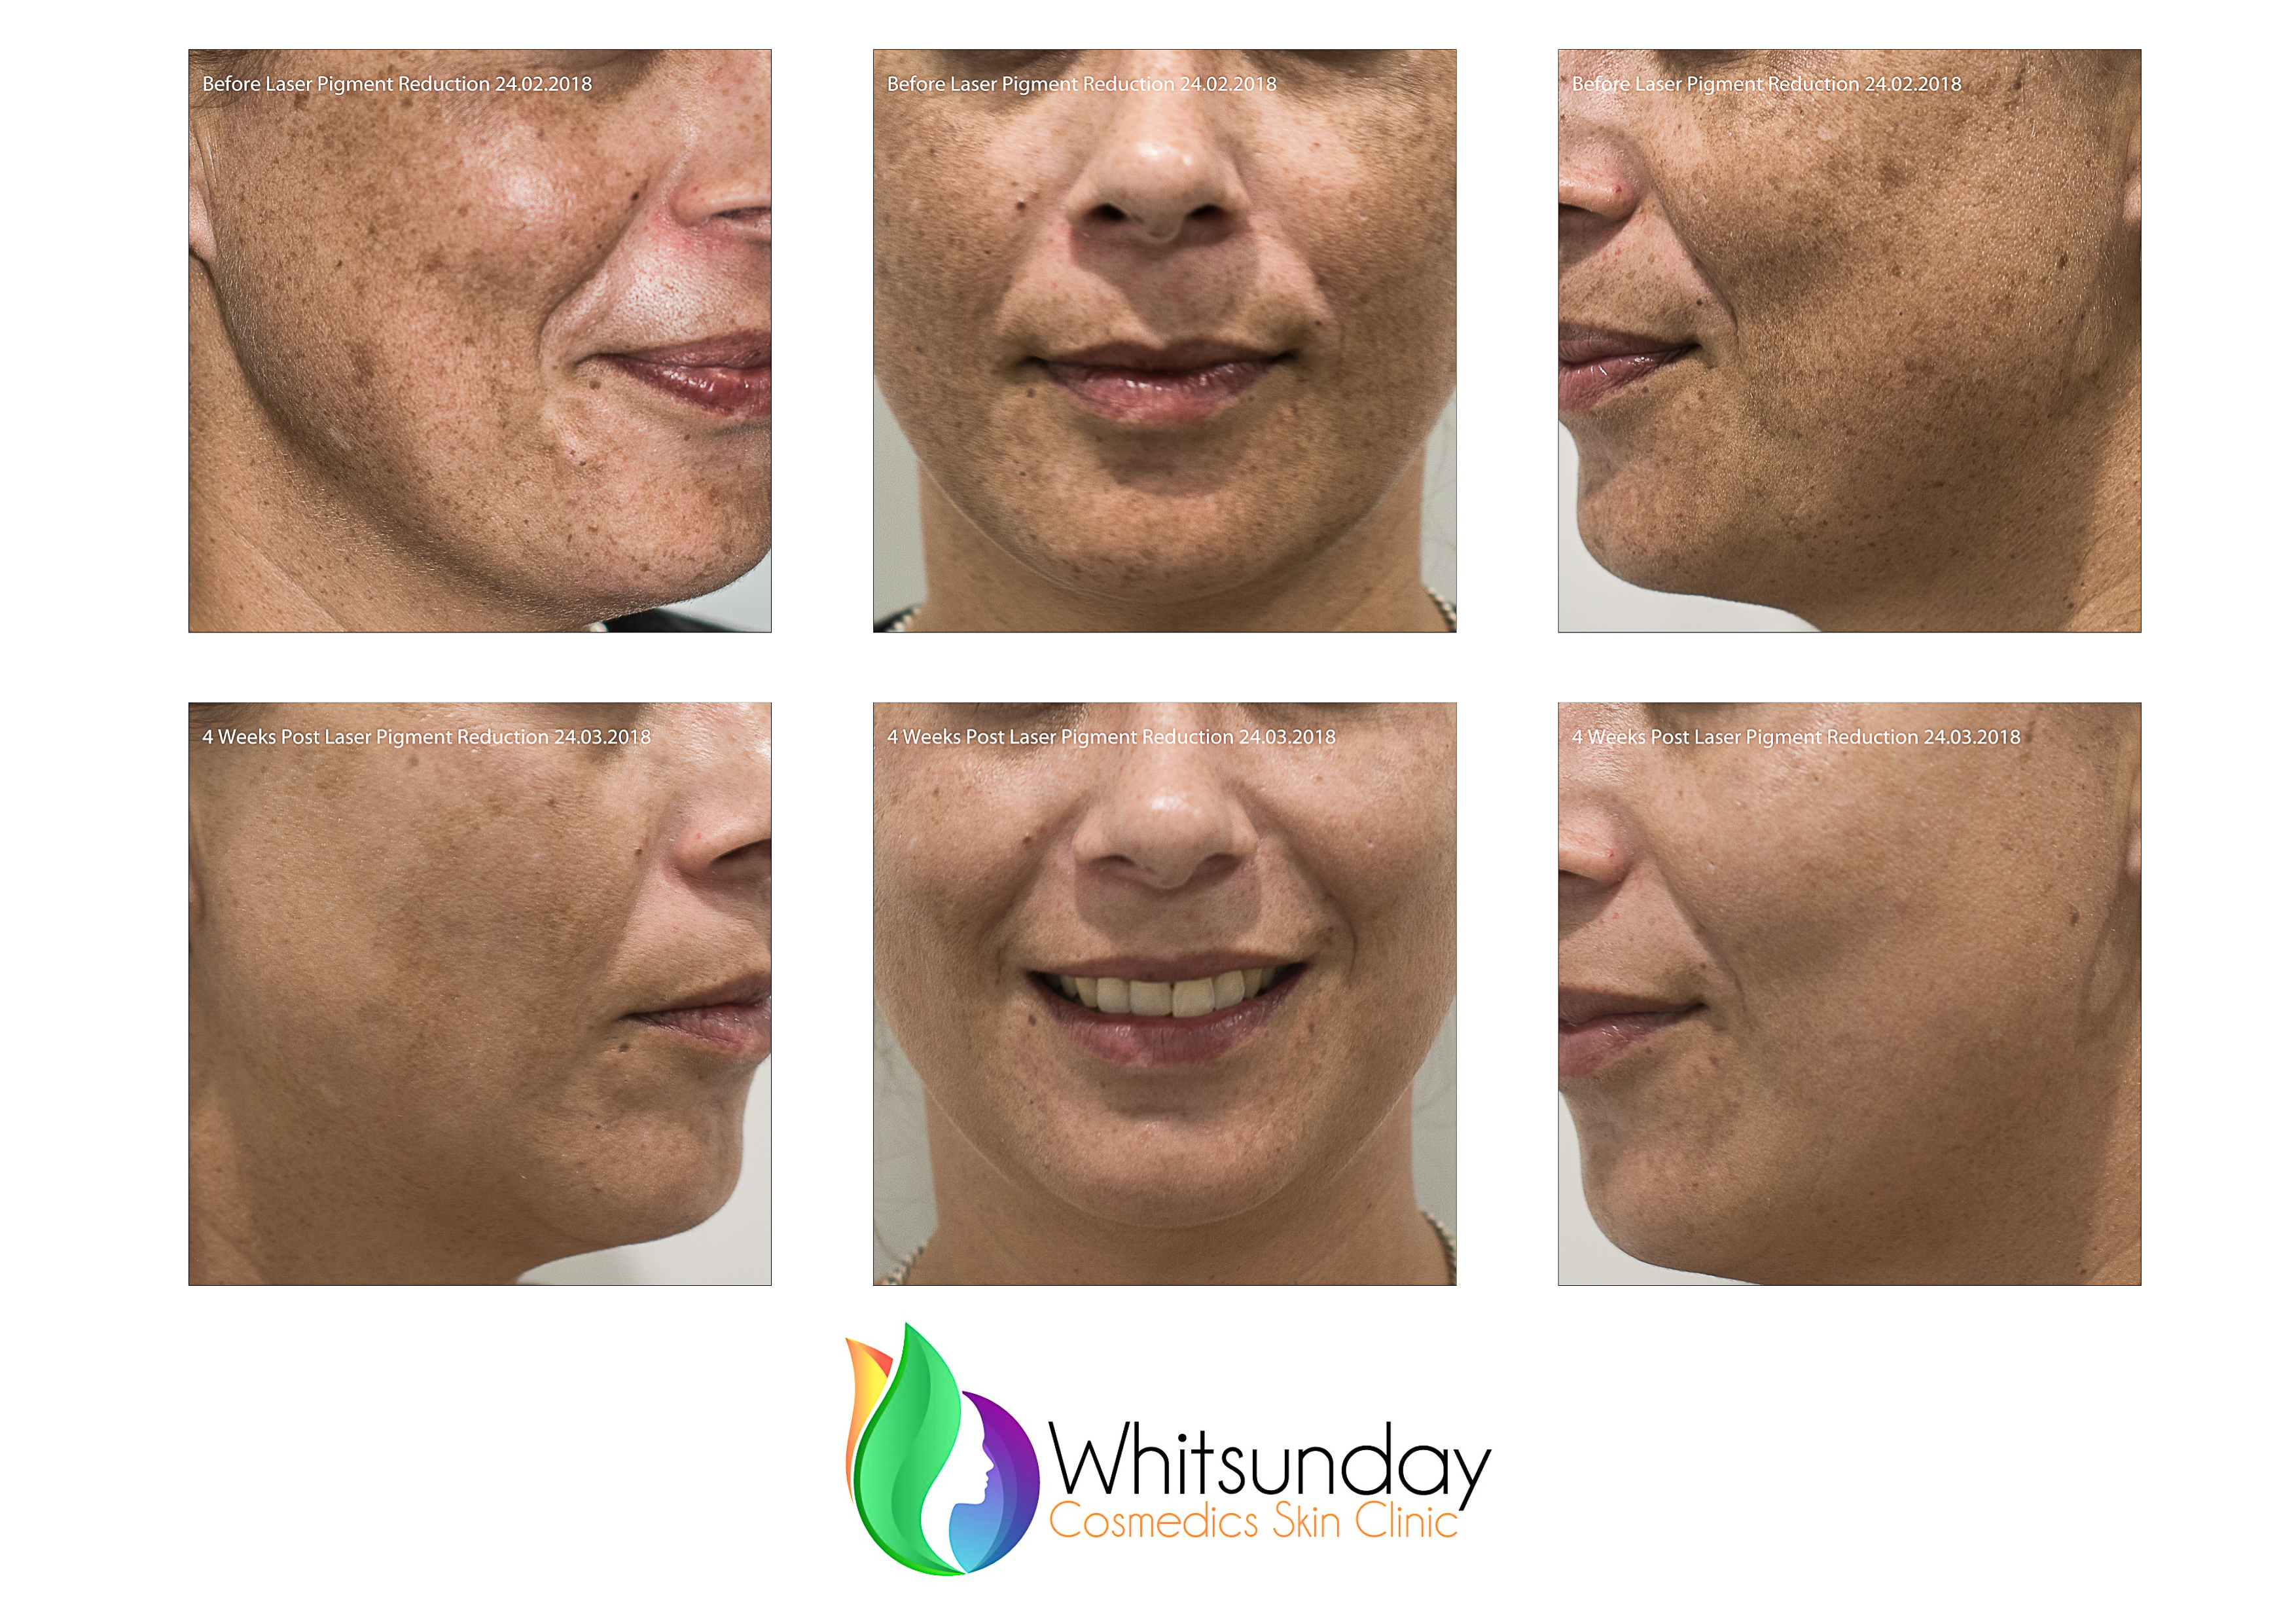 LASER Pigment Reduction for Sun-damaged Skin